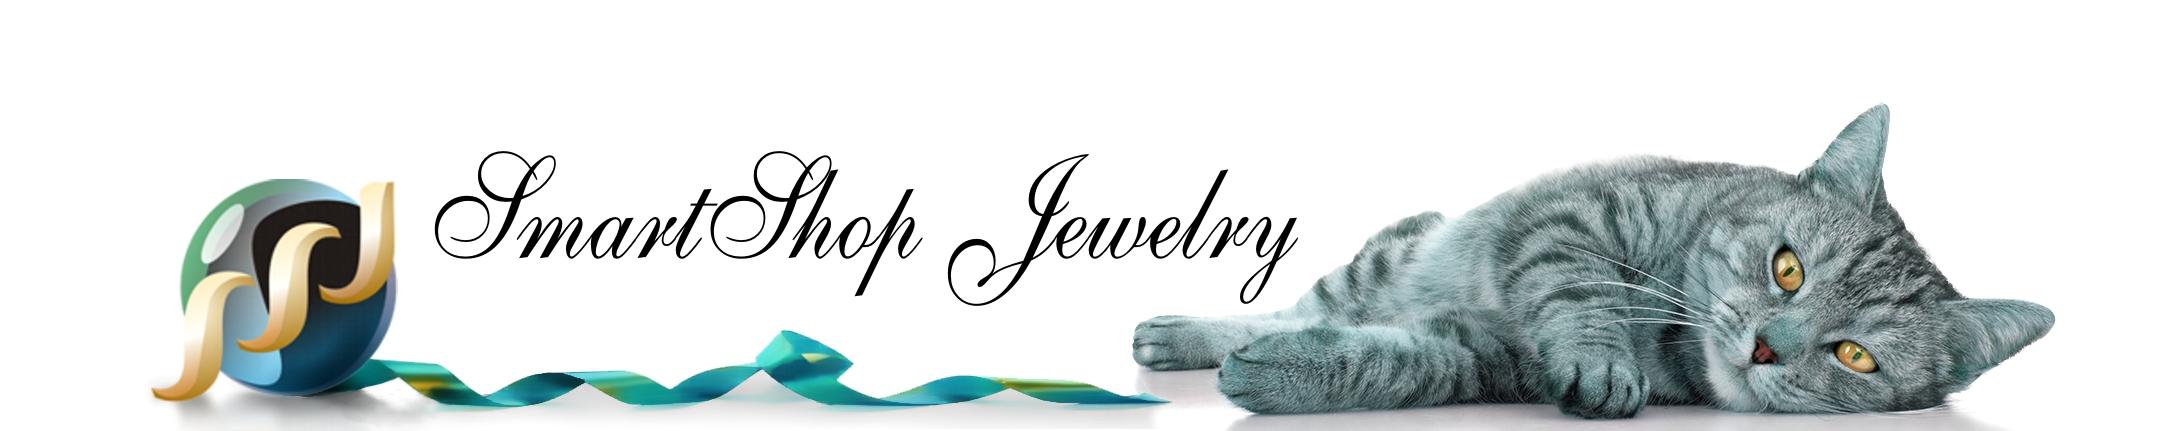 SmartShop  Jewelry